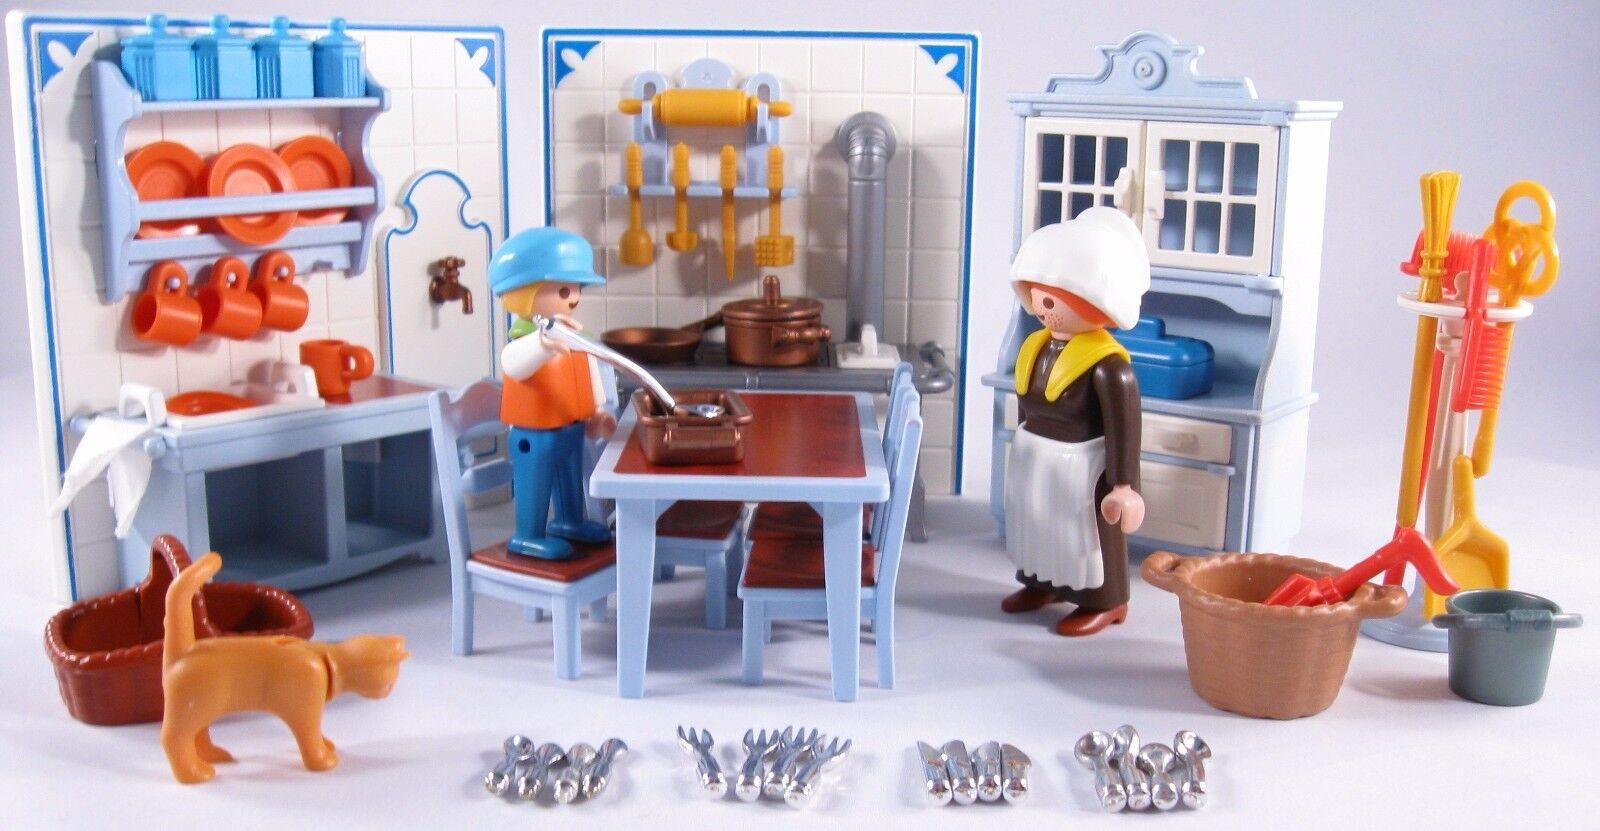 PLAYMOBIL VINTAGE 5322 KITCHEN blu VICTORIAN MANSION HOUSE 5300-100% EXCELLENT